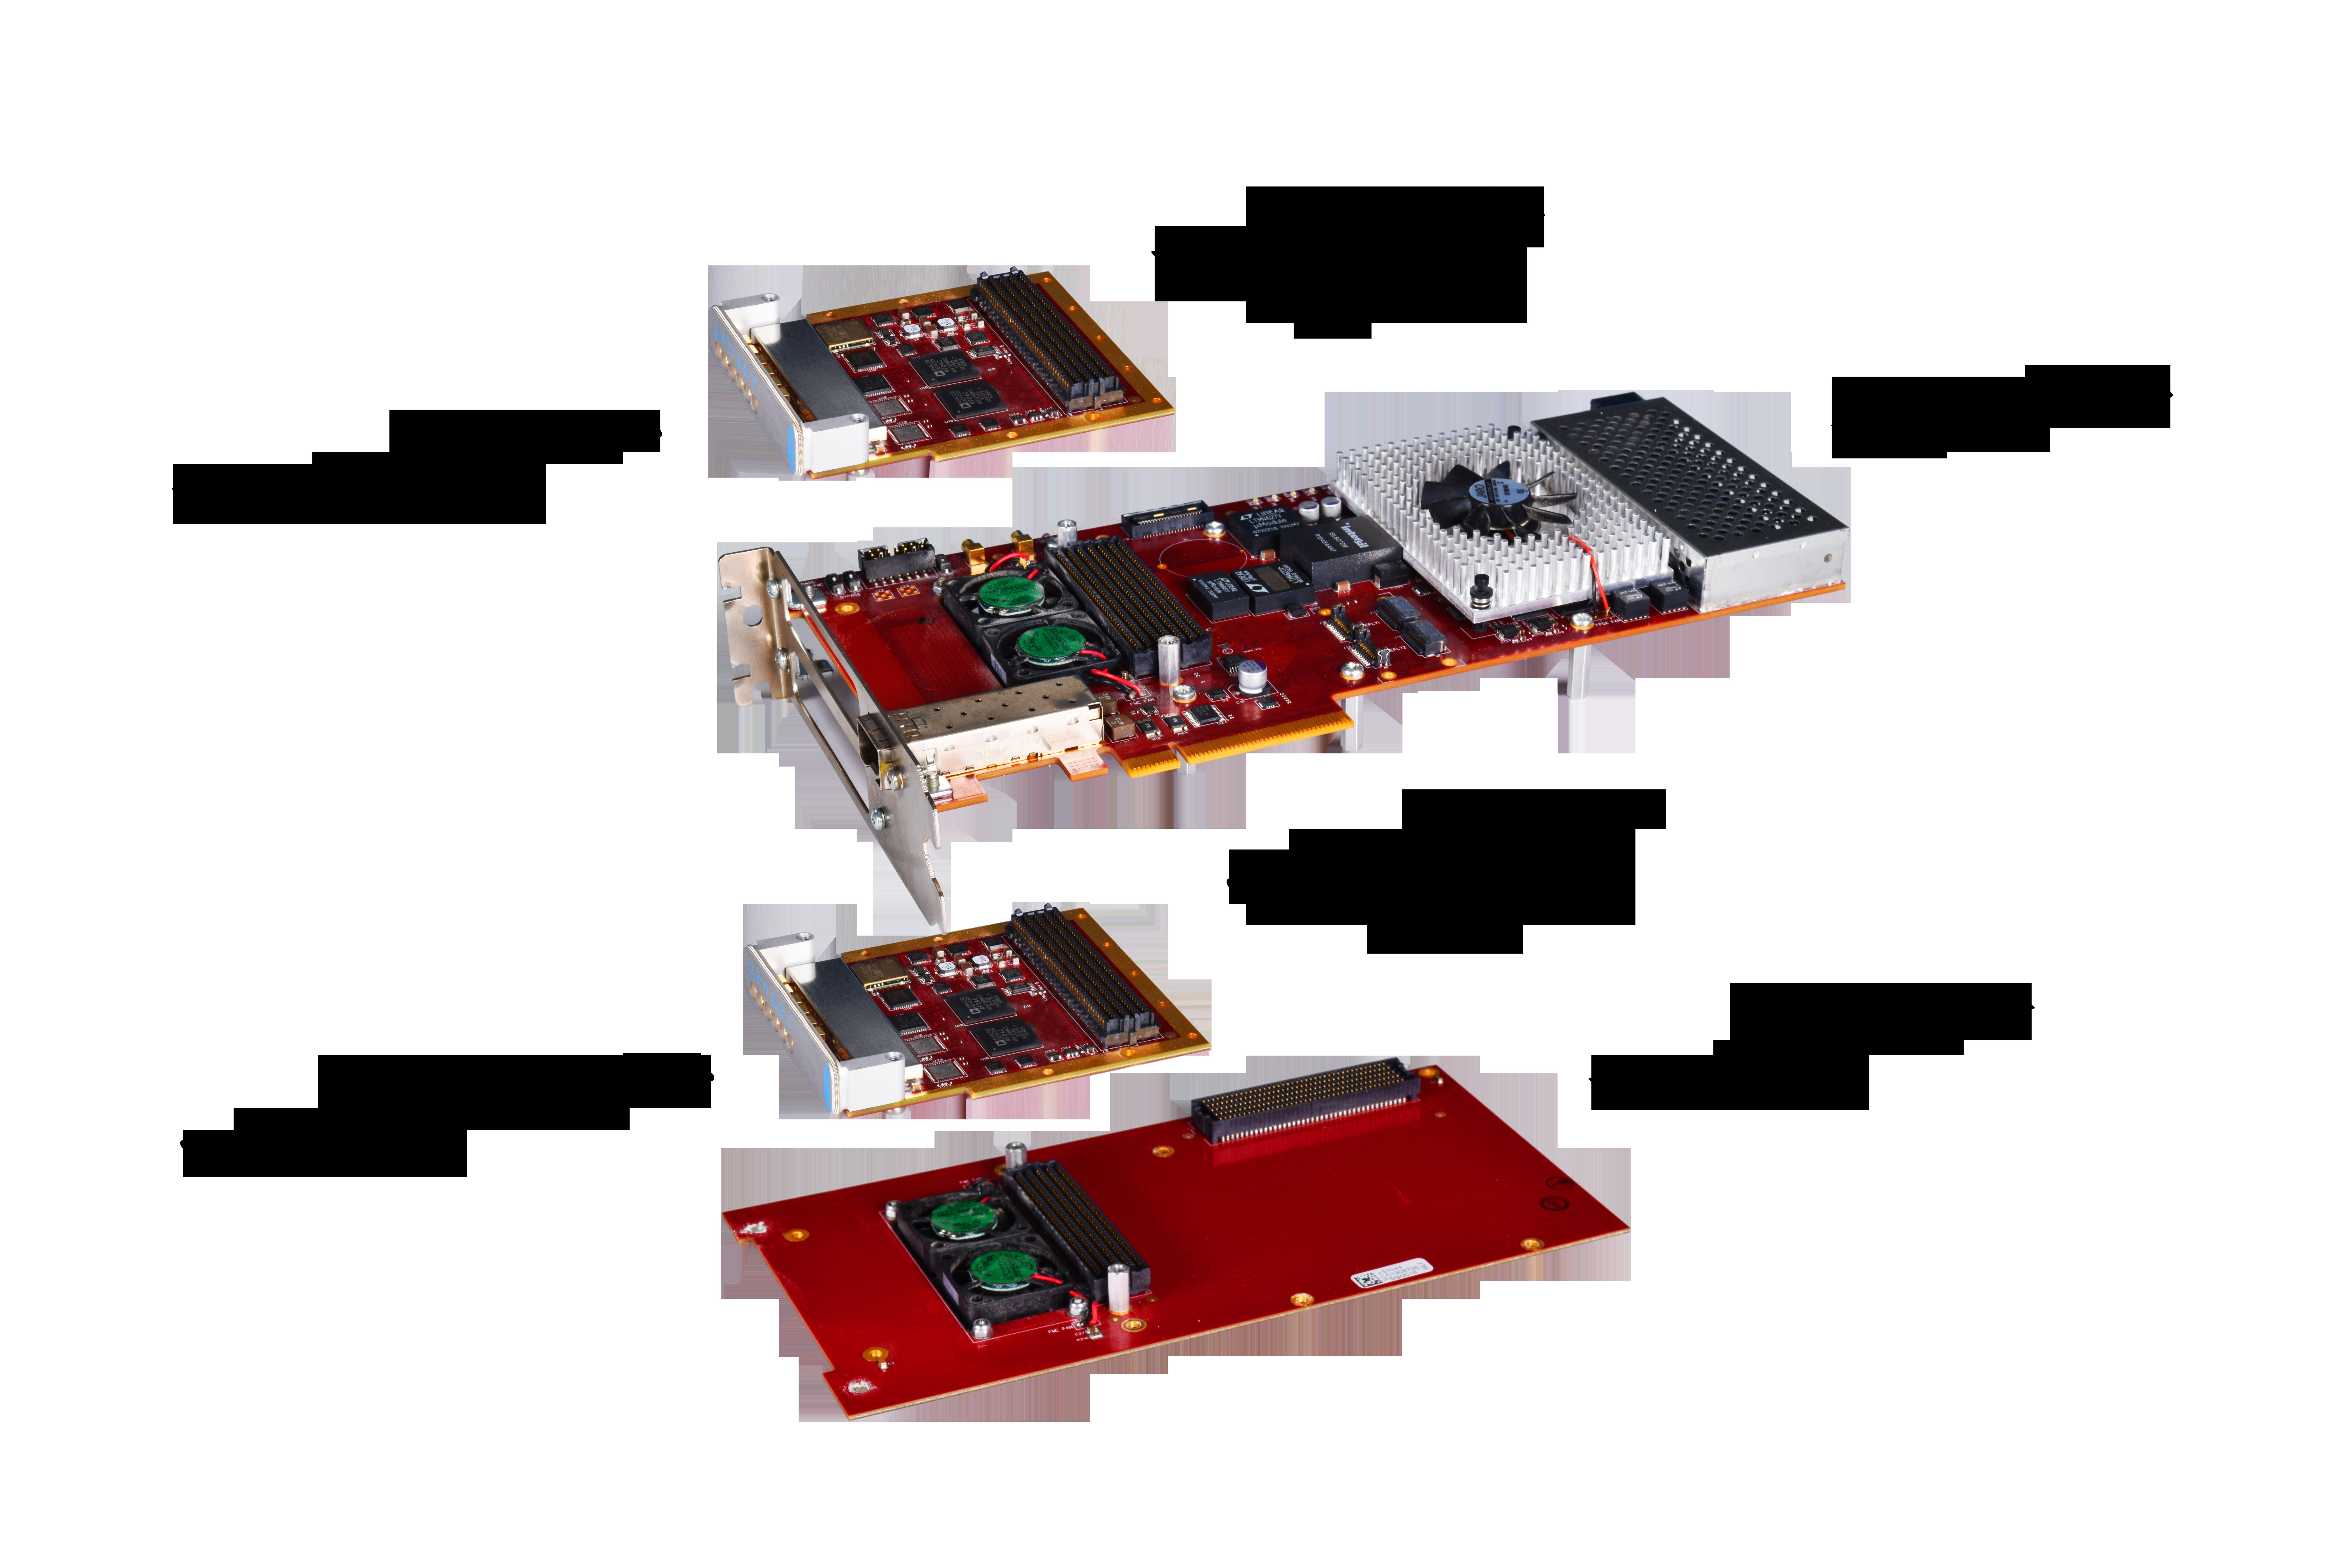 FPGAhdfgvasbjnm